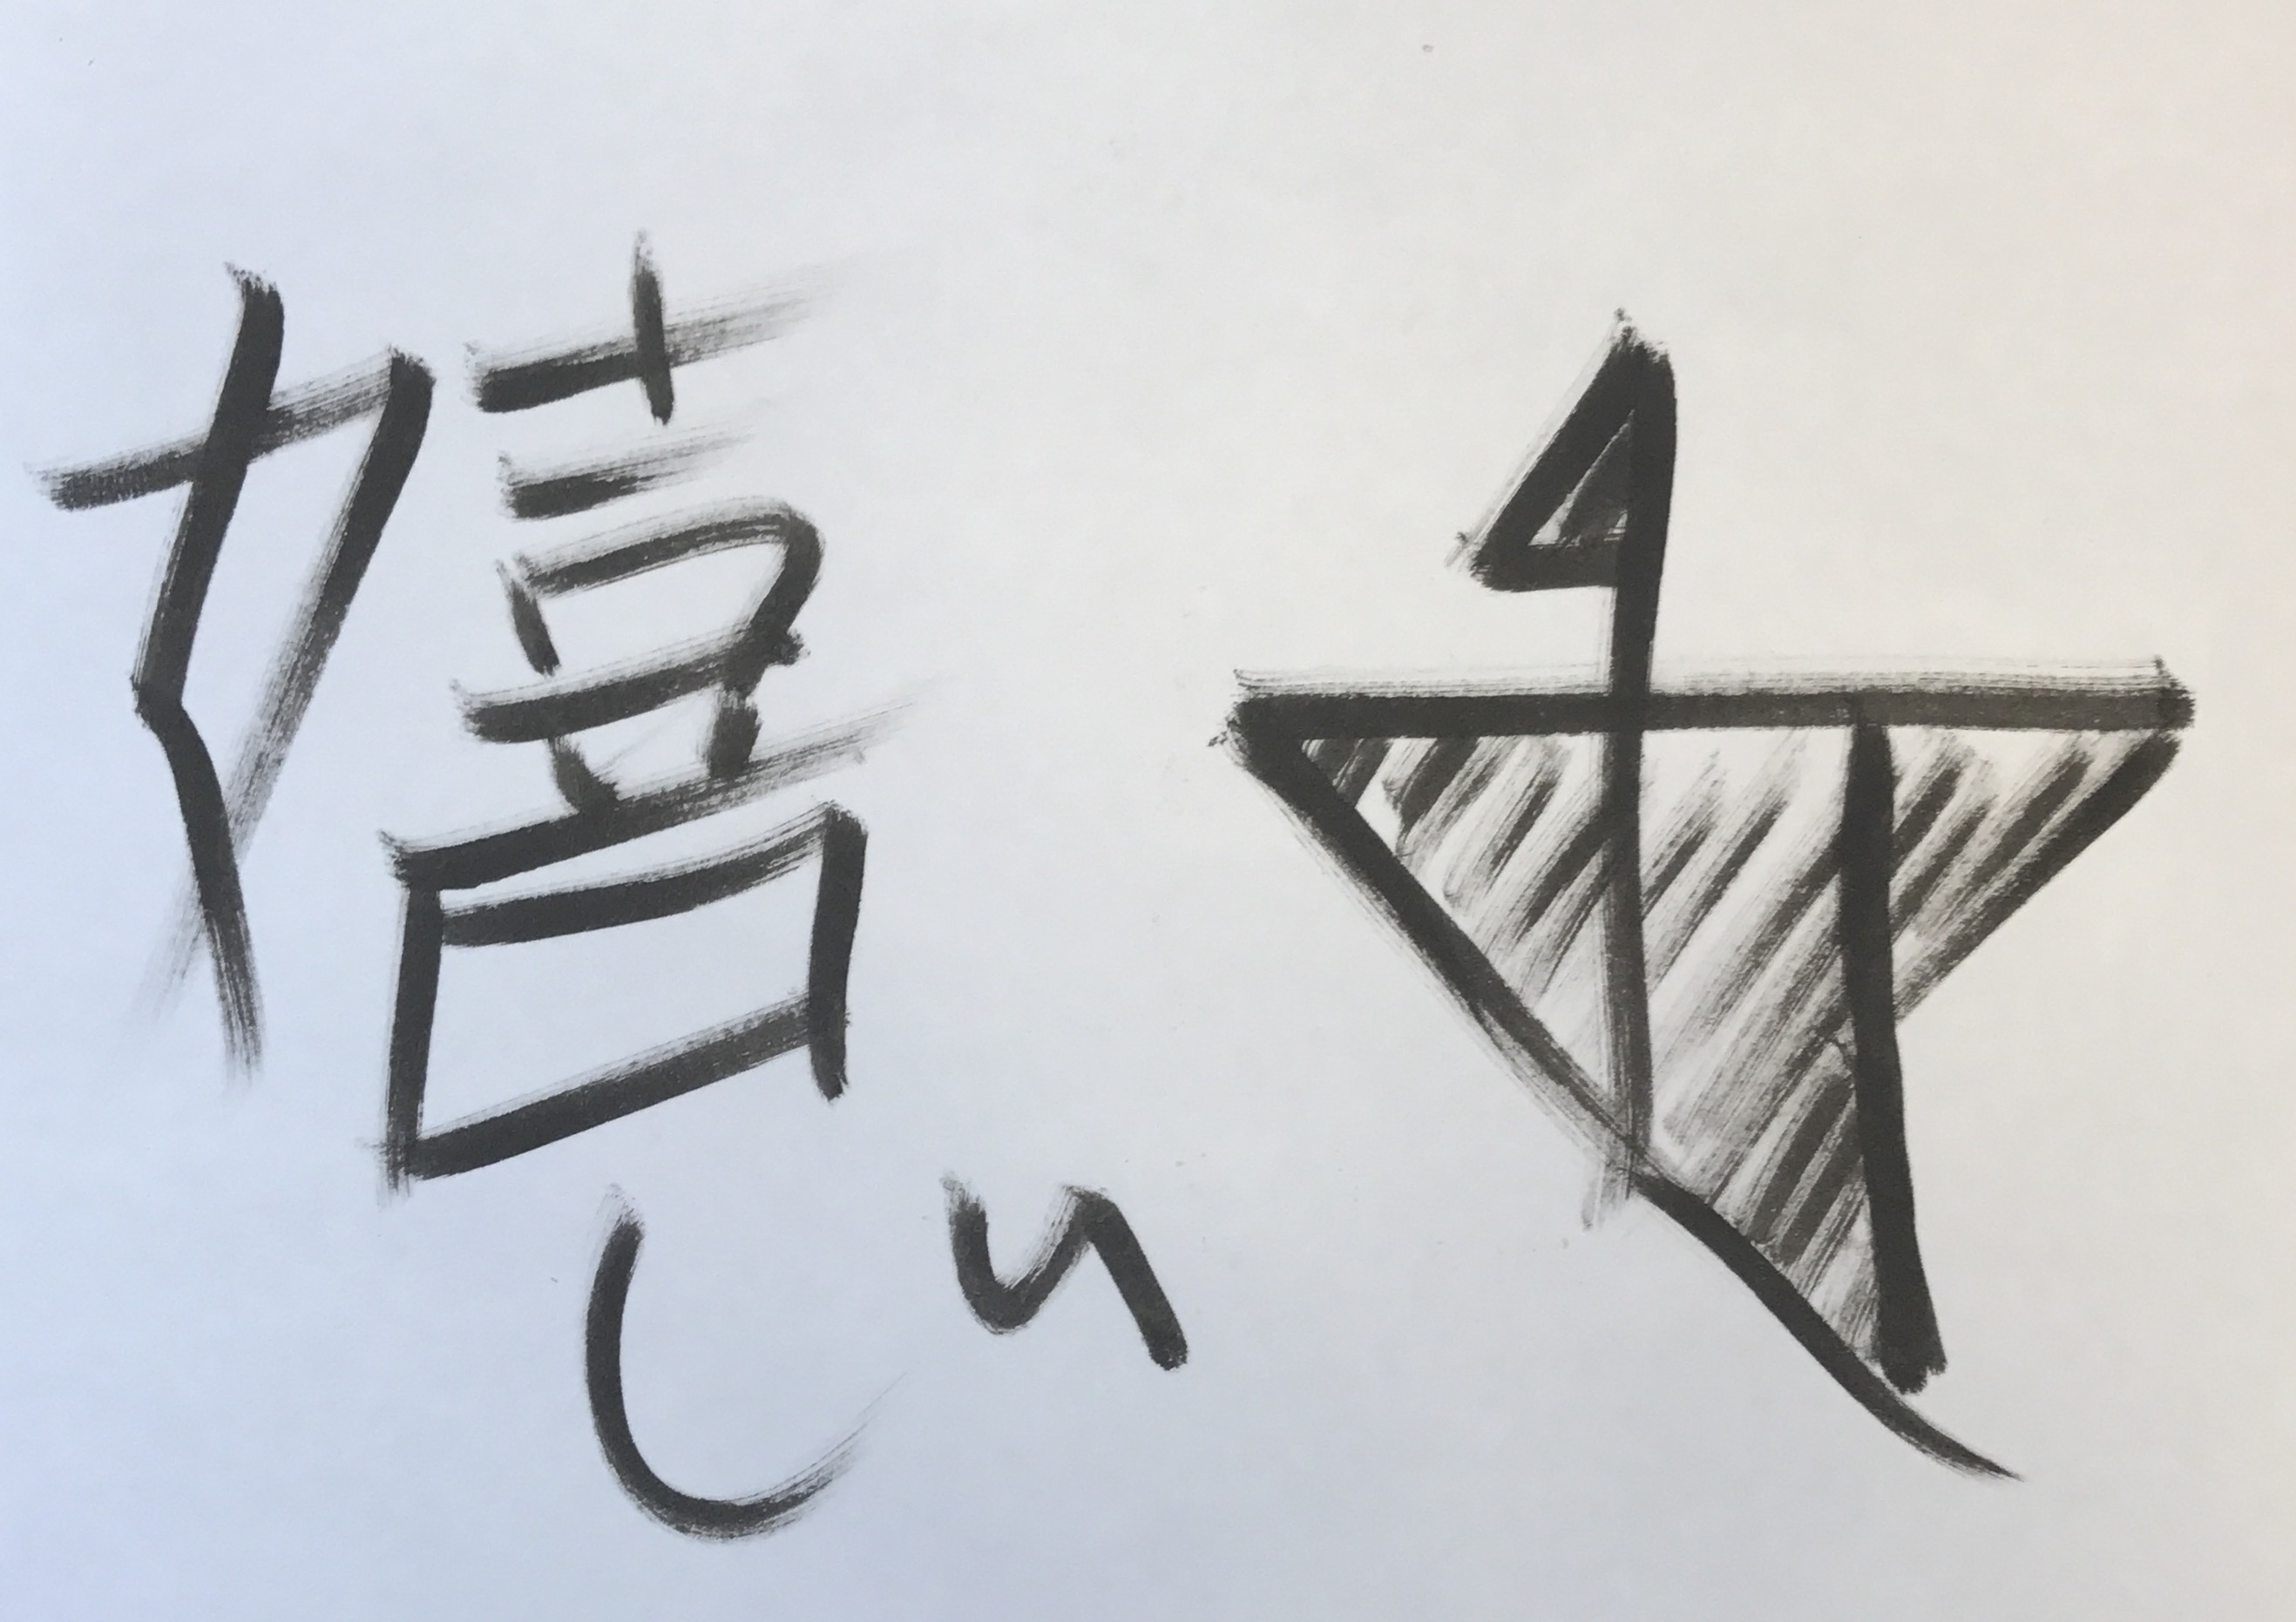 Happy 美しい 日本語 書道 鳥 墨汁 Japanese bird calligraphy marker shodo art writing artwork ink